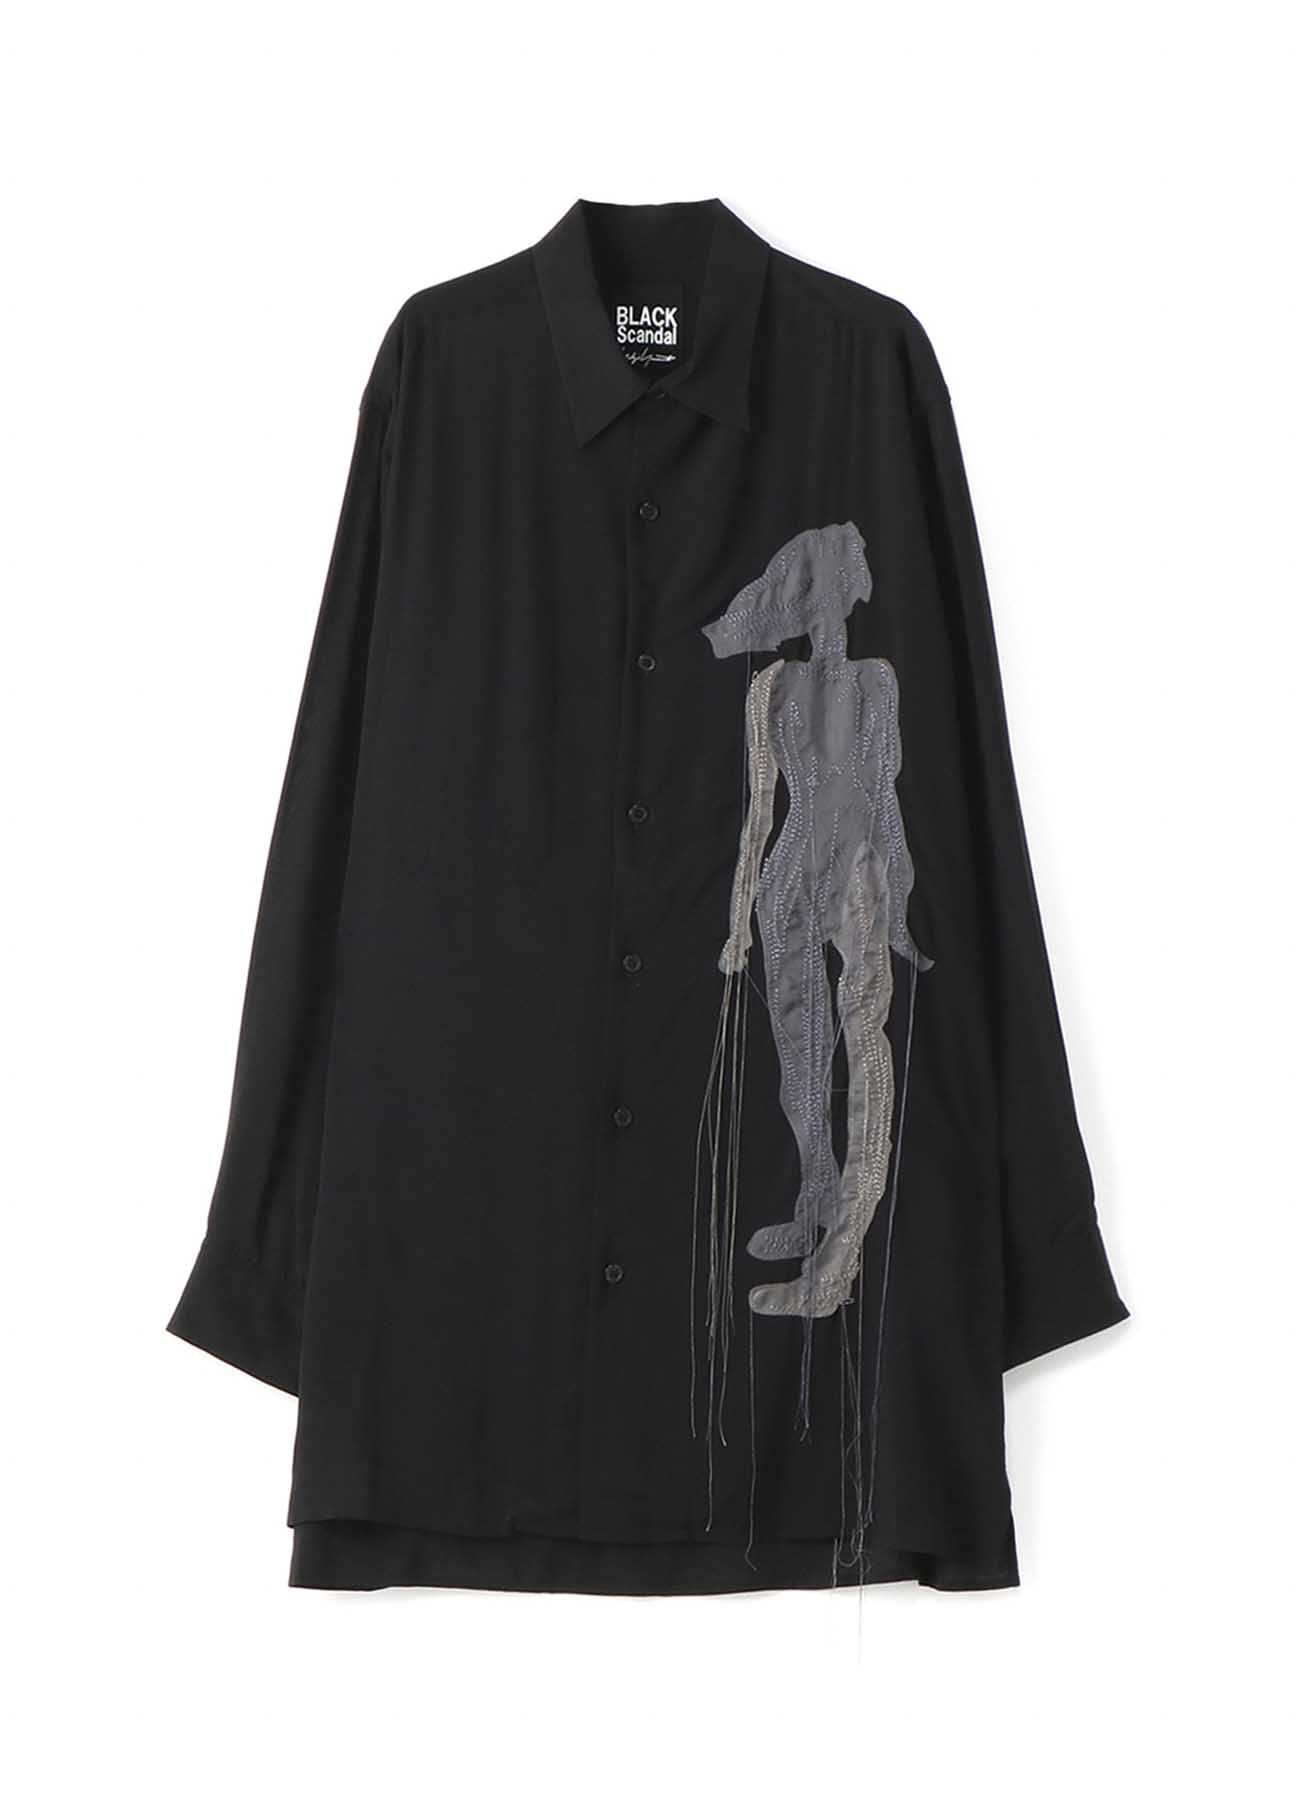 BLACK Scandal? 裾スクエア「シルエット」刺繍シャツ